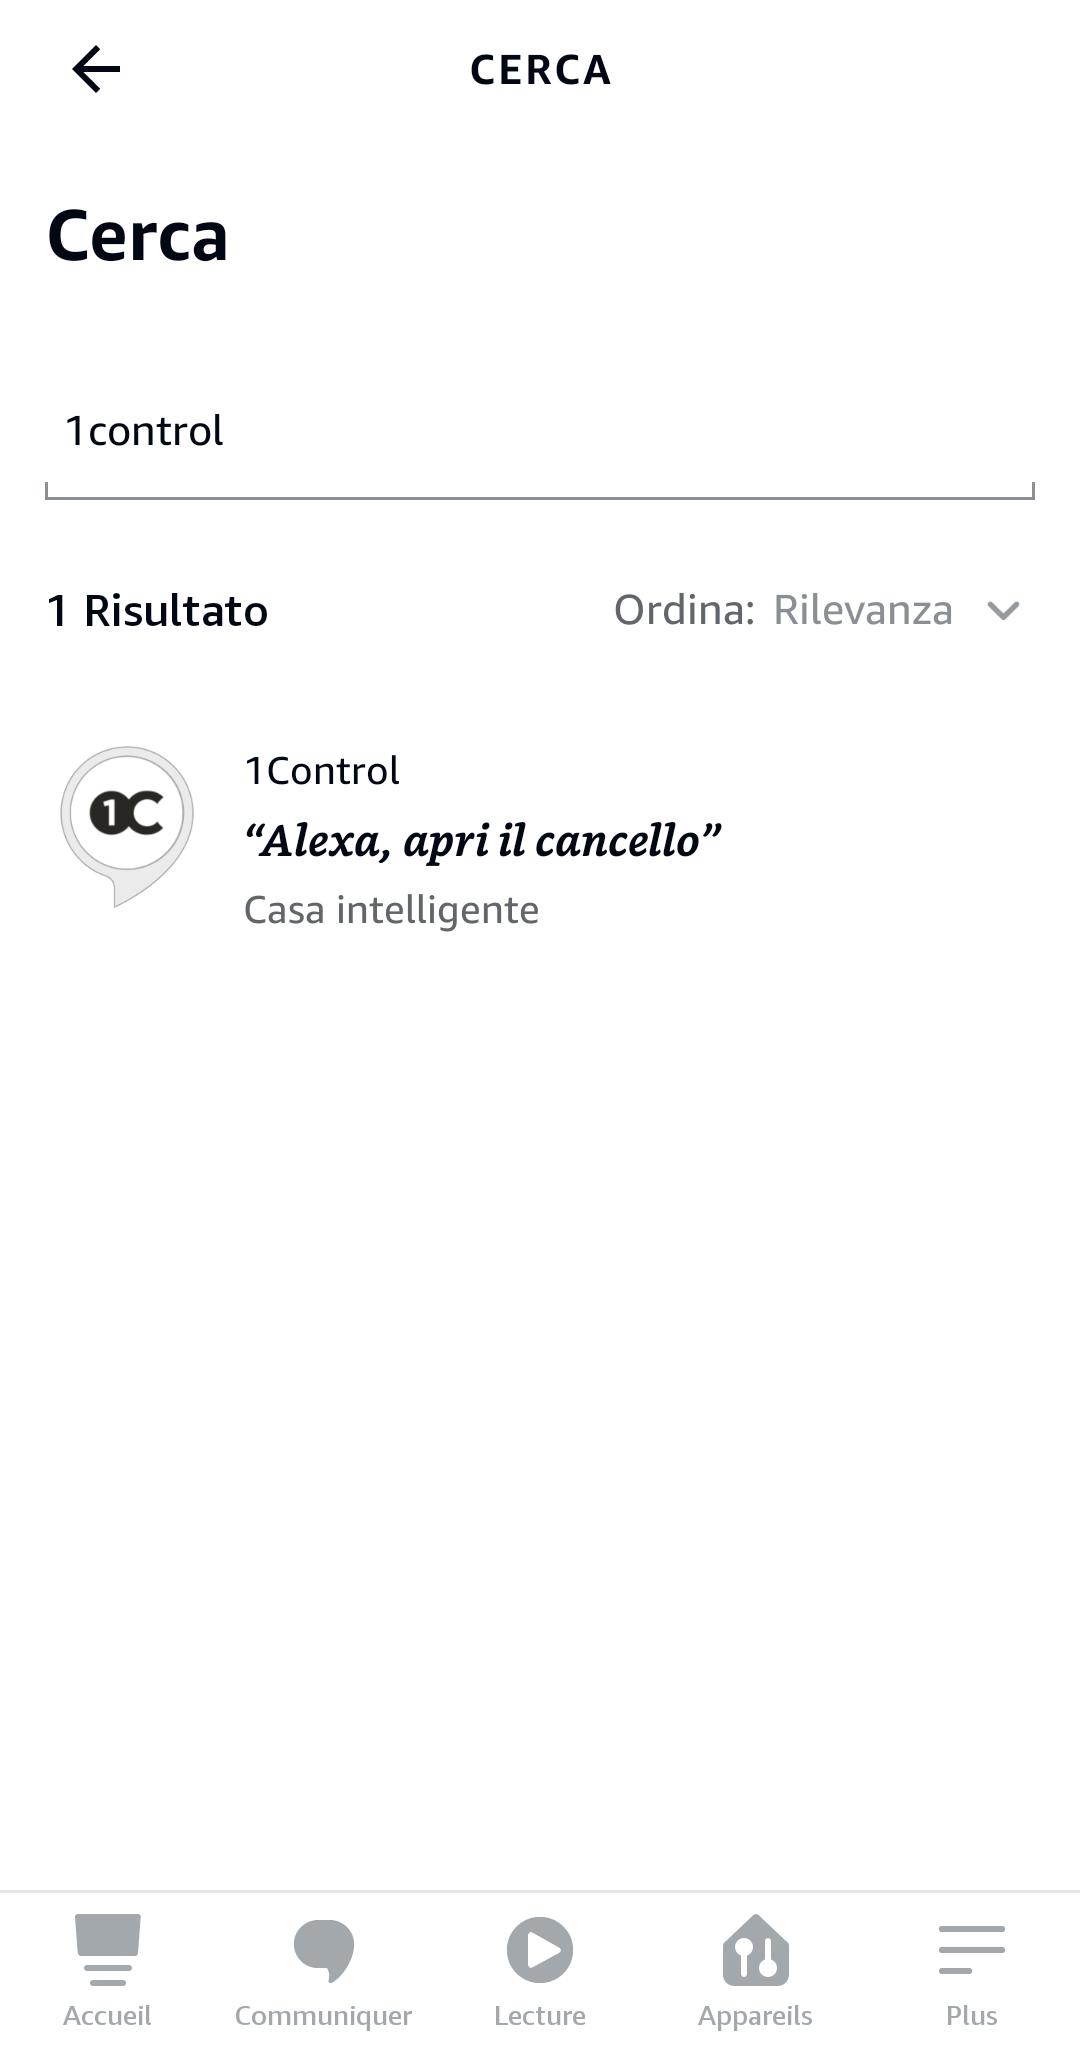 https://www.1control.eu/guide/img/alexa/ita/Guida_alexa_4_ita.png